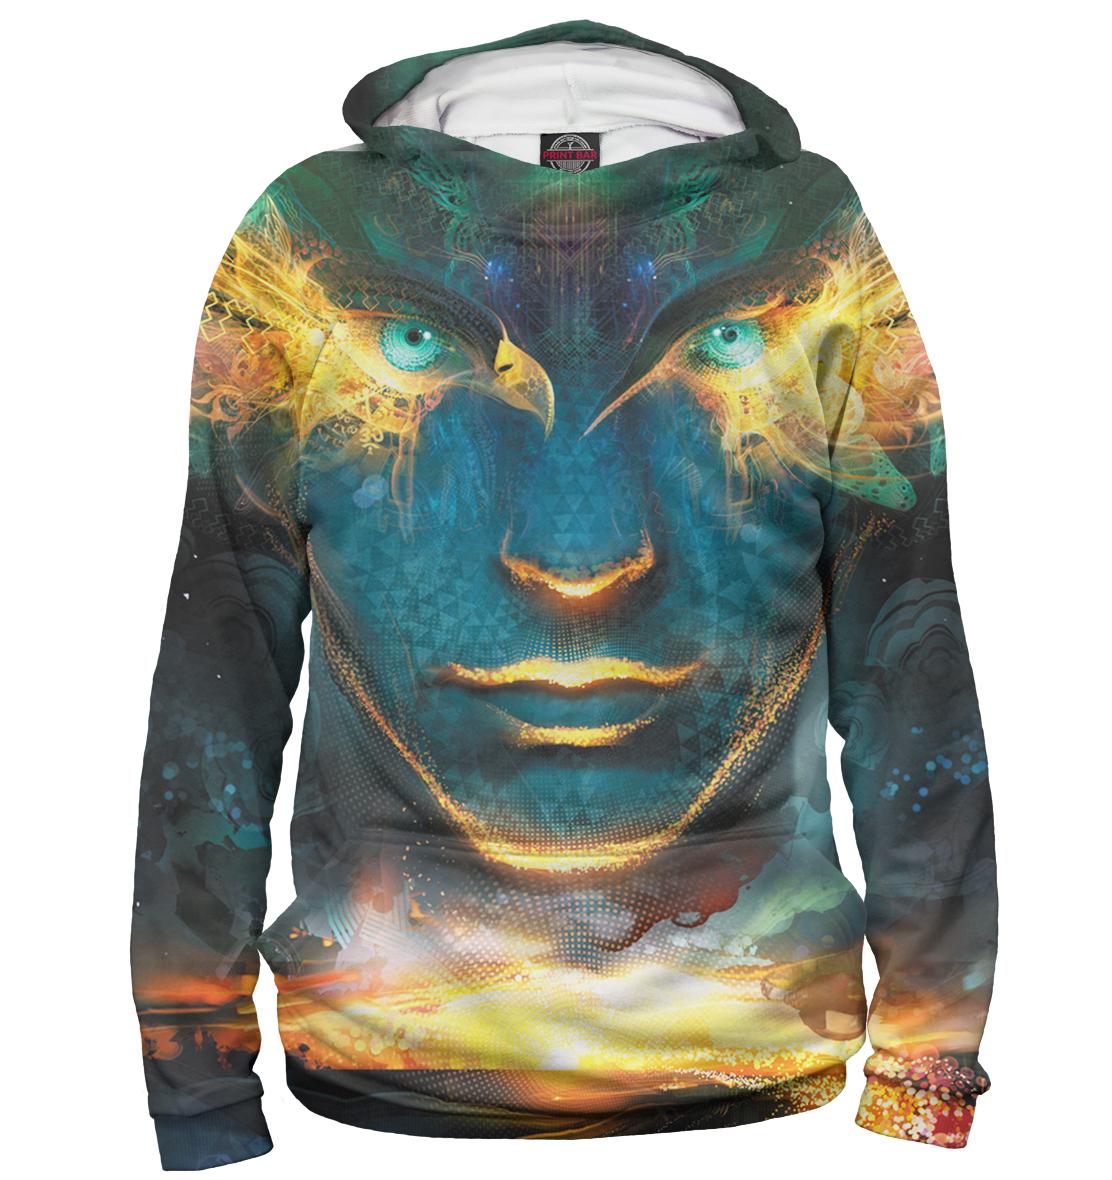 Купить Psychedelic, Printbar, Худи, PSY-616028-hud-2